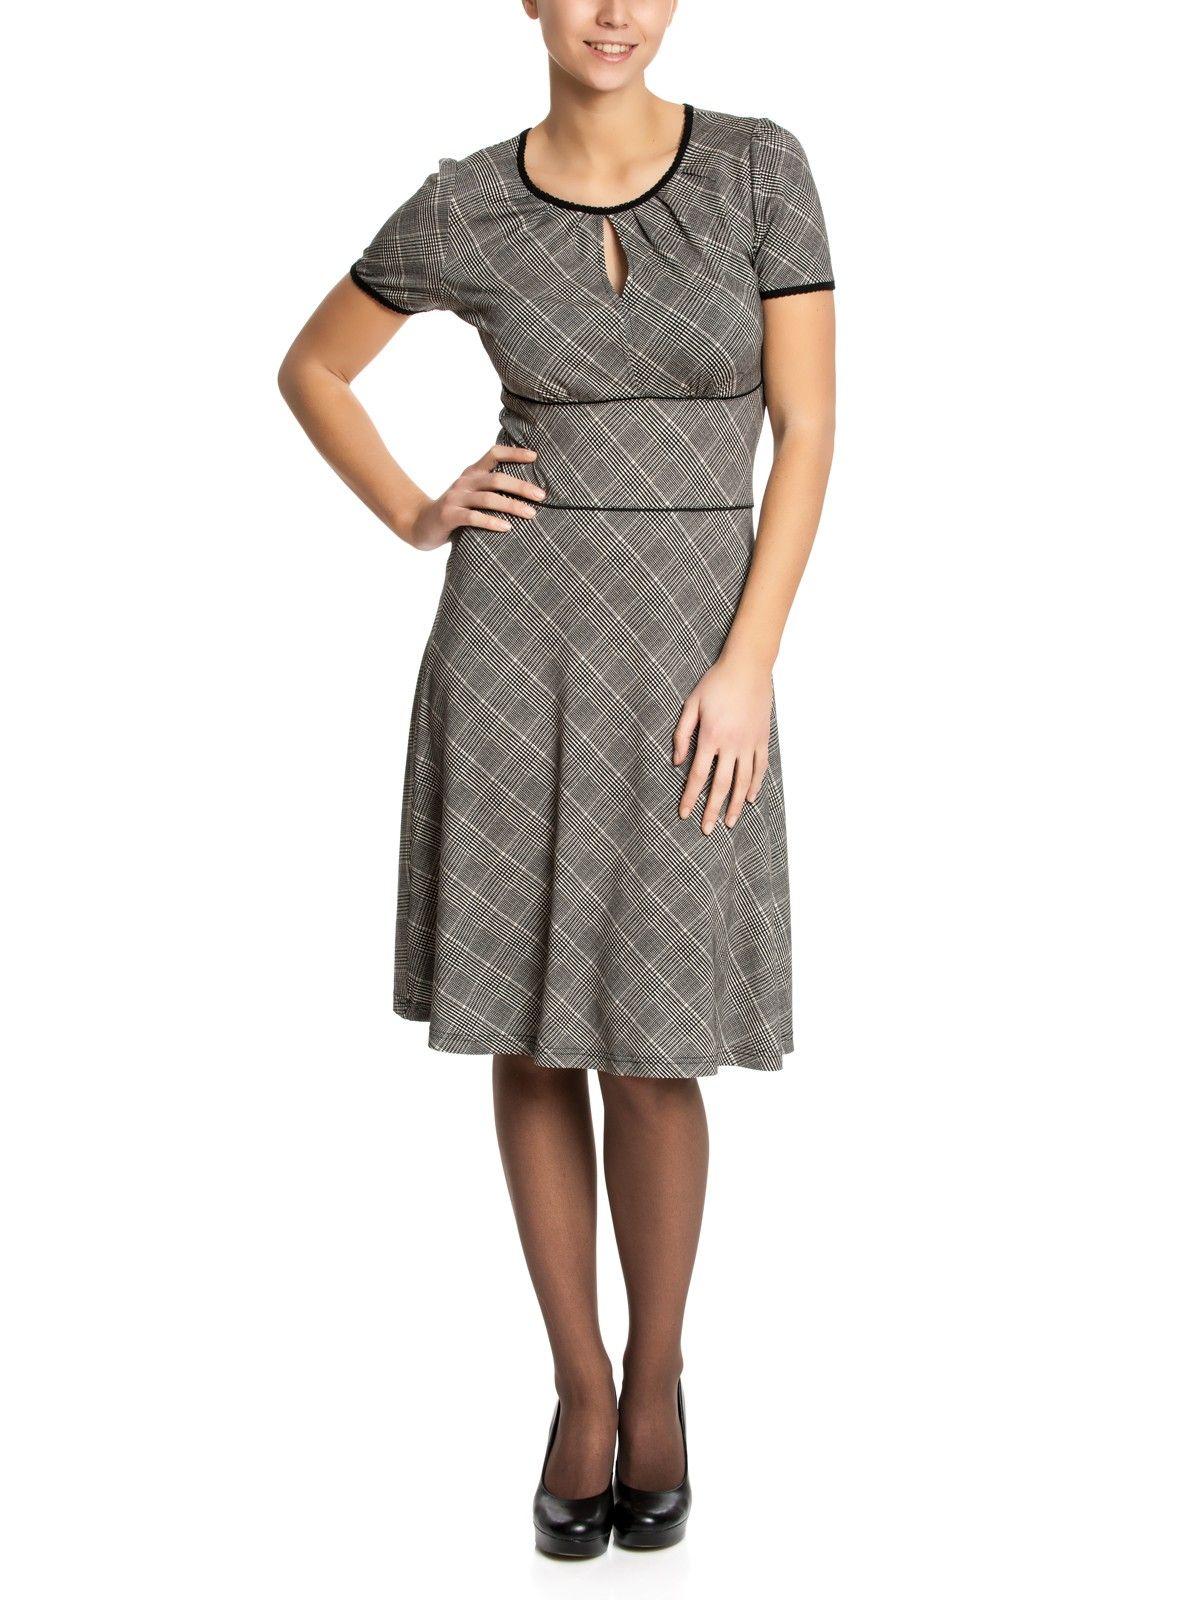 Up-Town Girl Round Dress   napo-shop.de